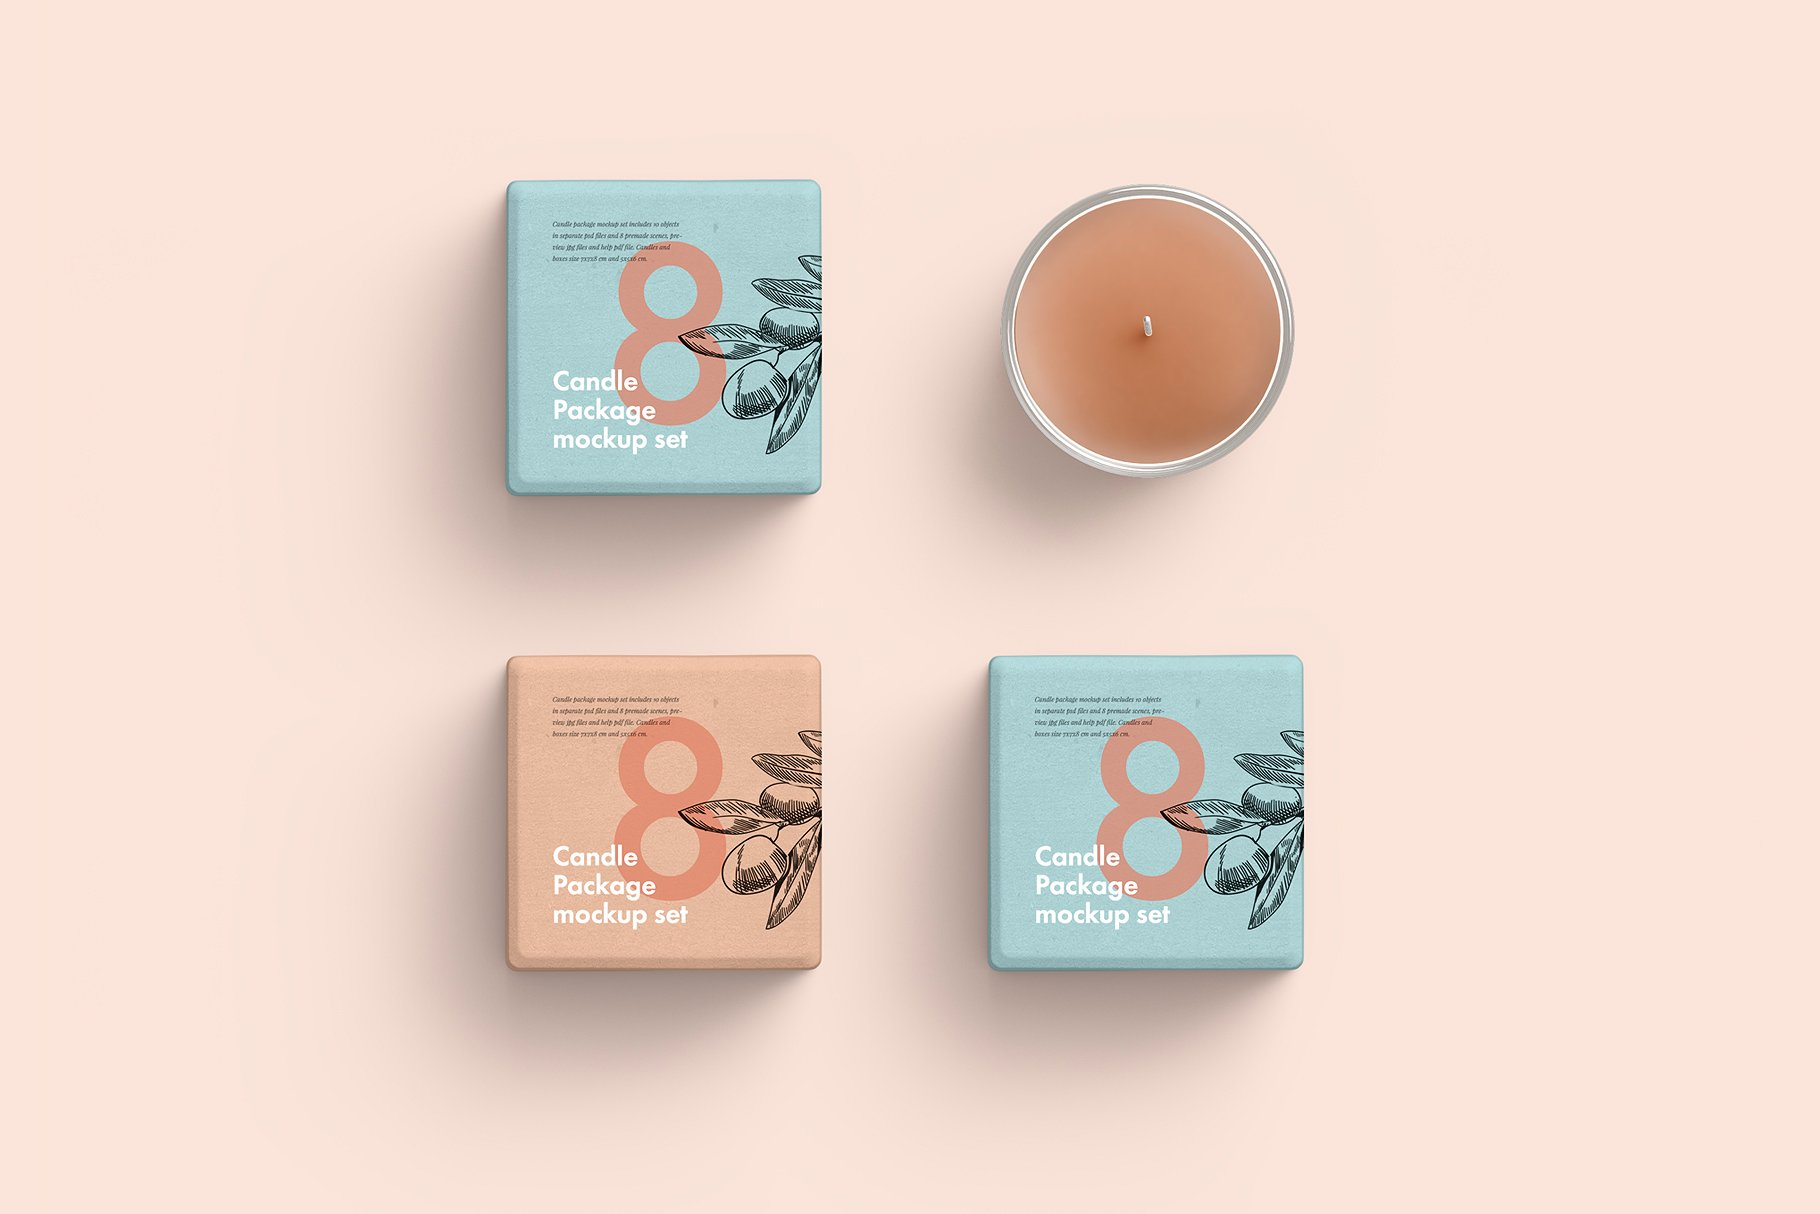 粉色系香薰玻璃杯包装展示样机 Candle Glass And Box Packaging